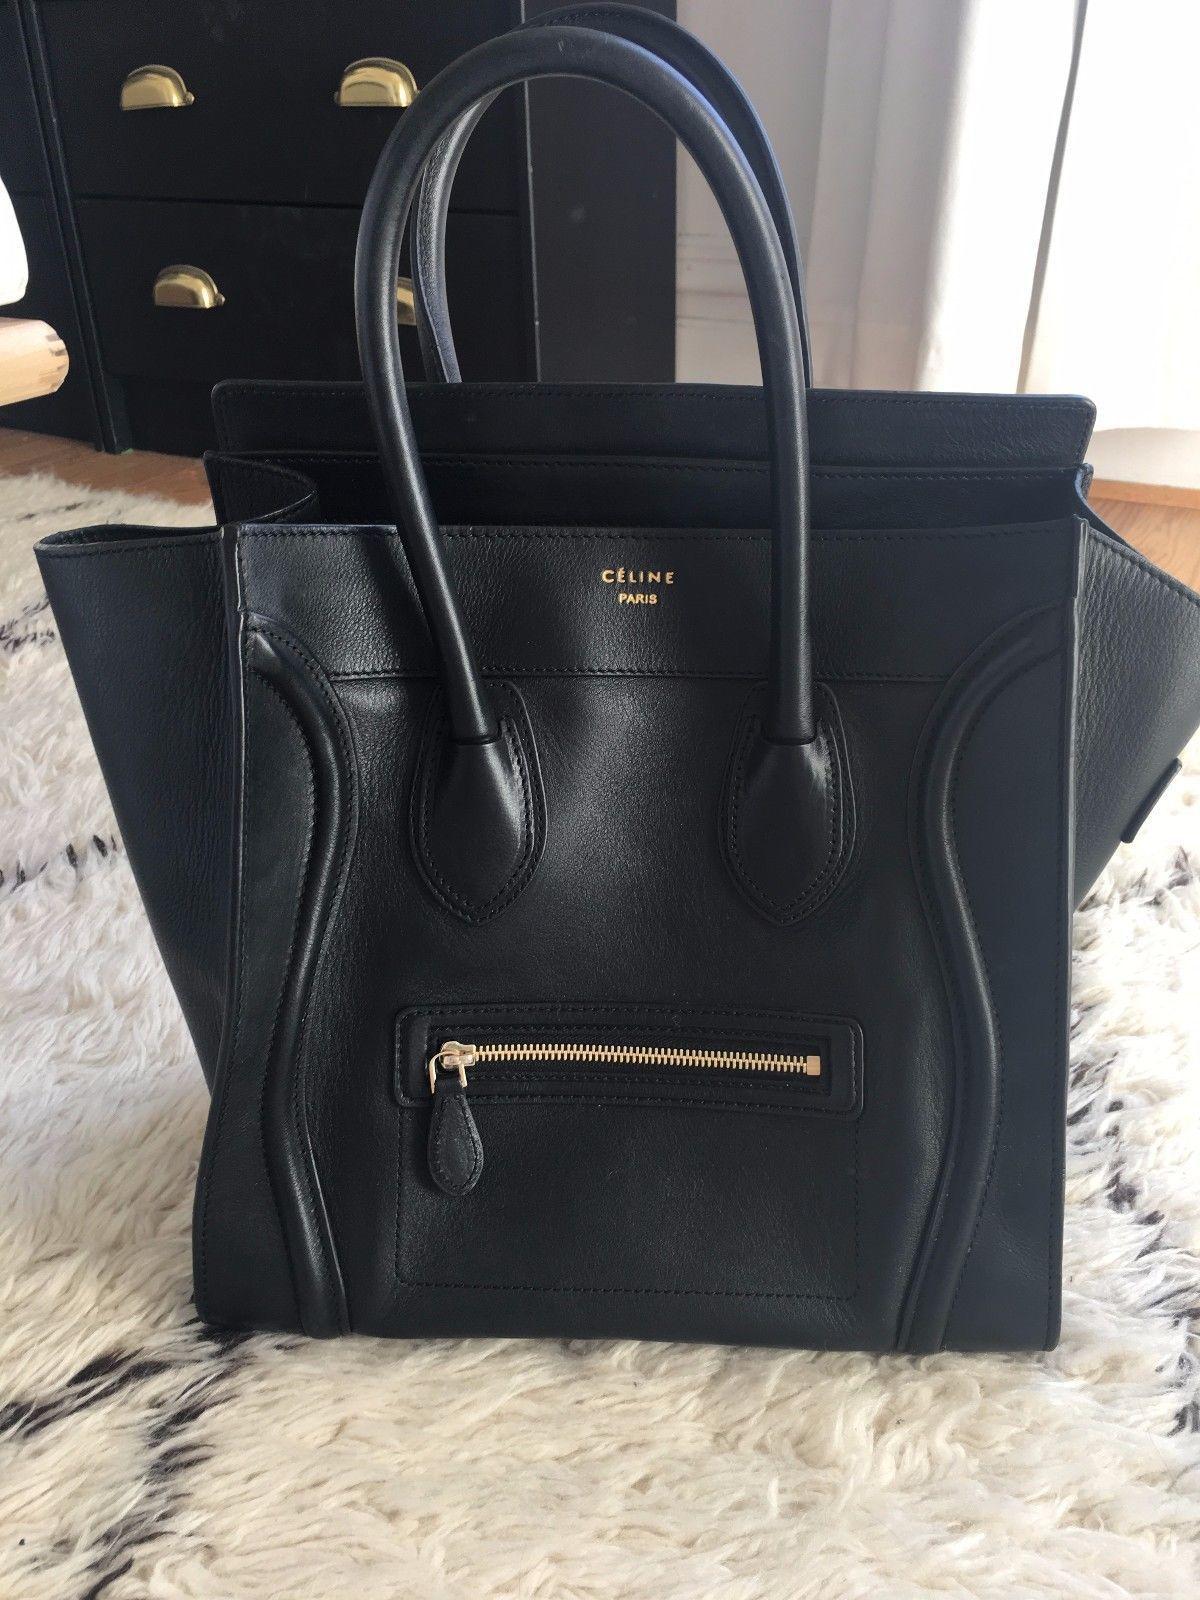 Celine Phantom Luggage Bag In Black Leather 26cm